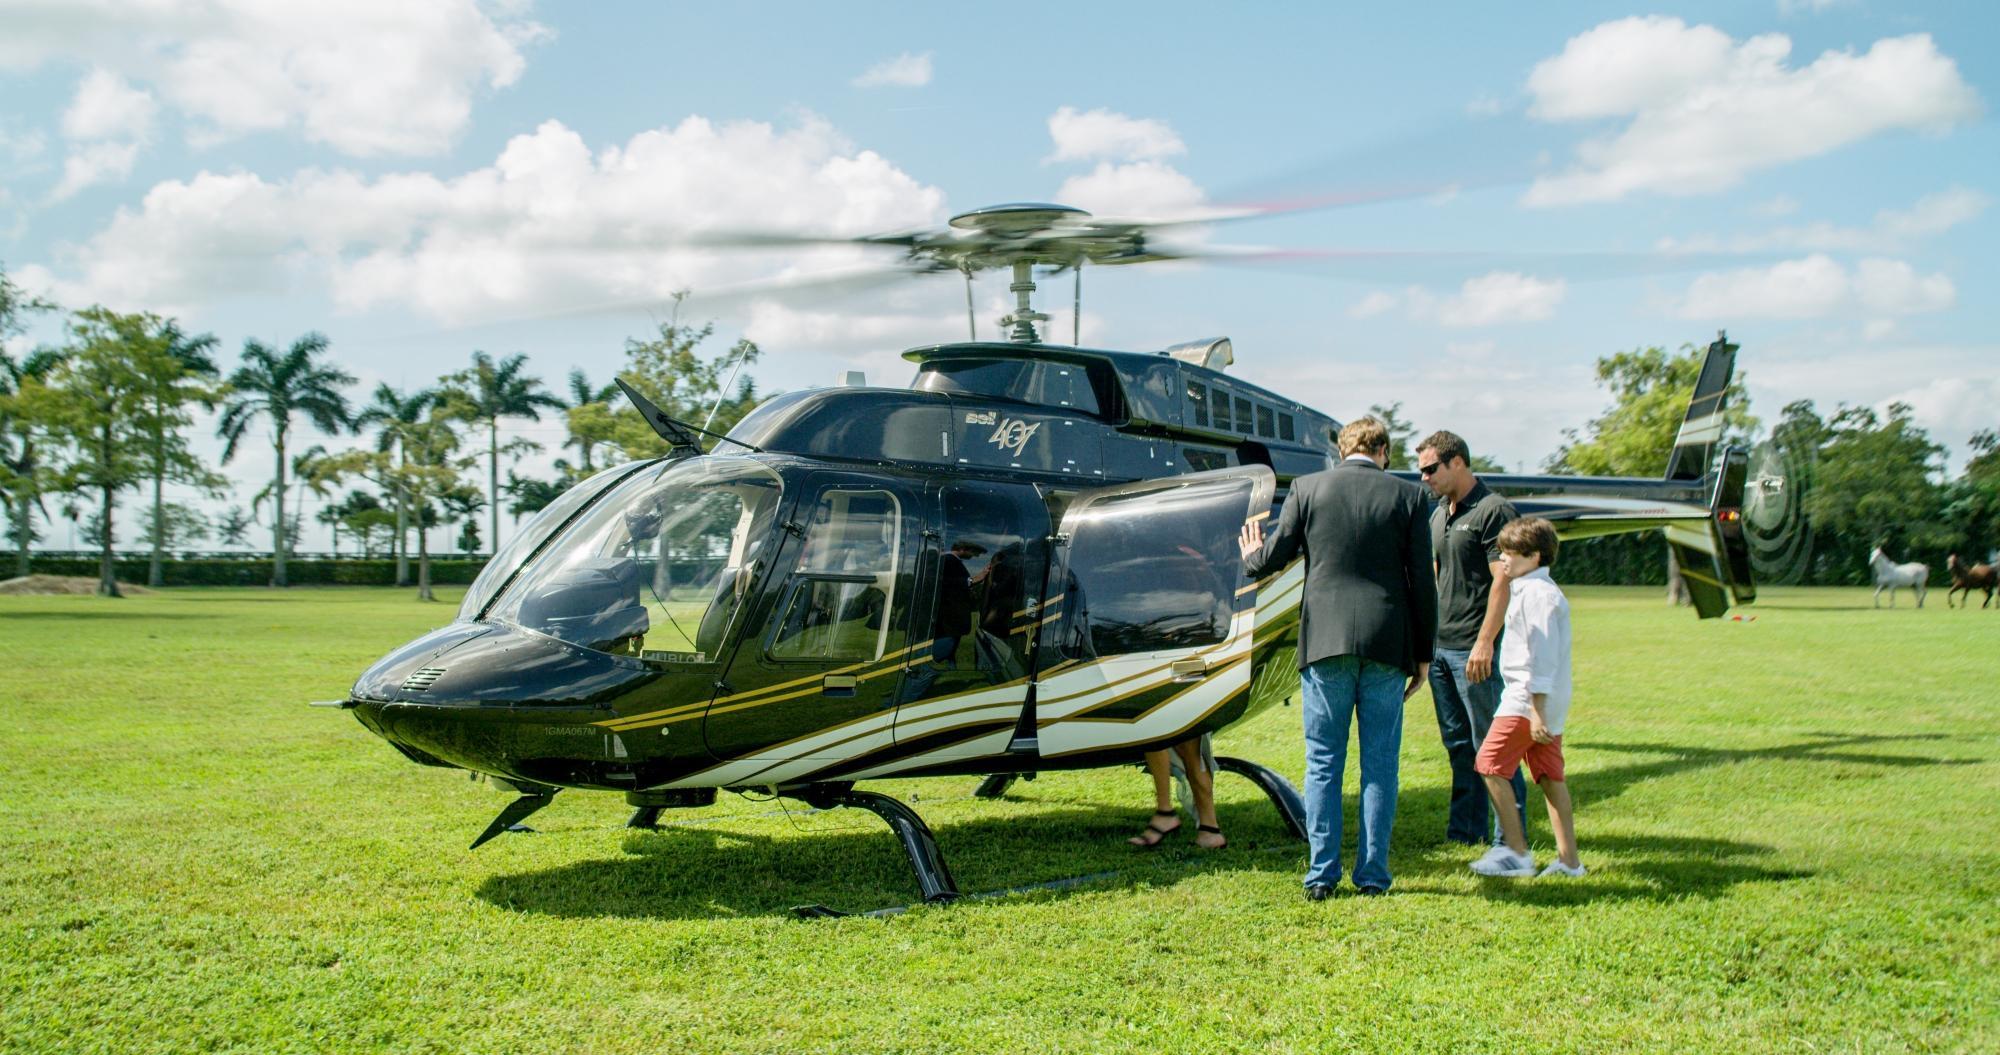 FAA Registered Heliport